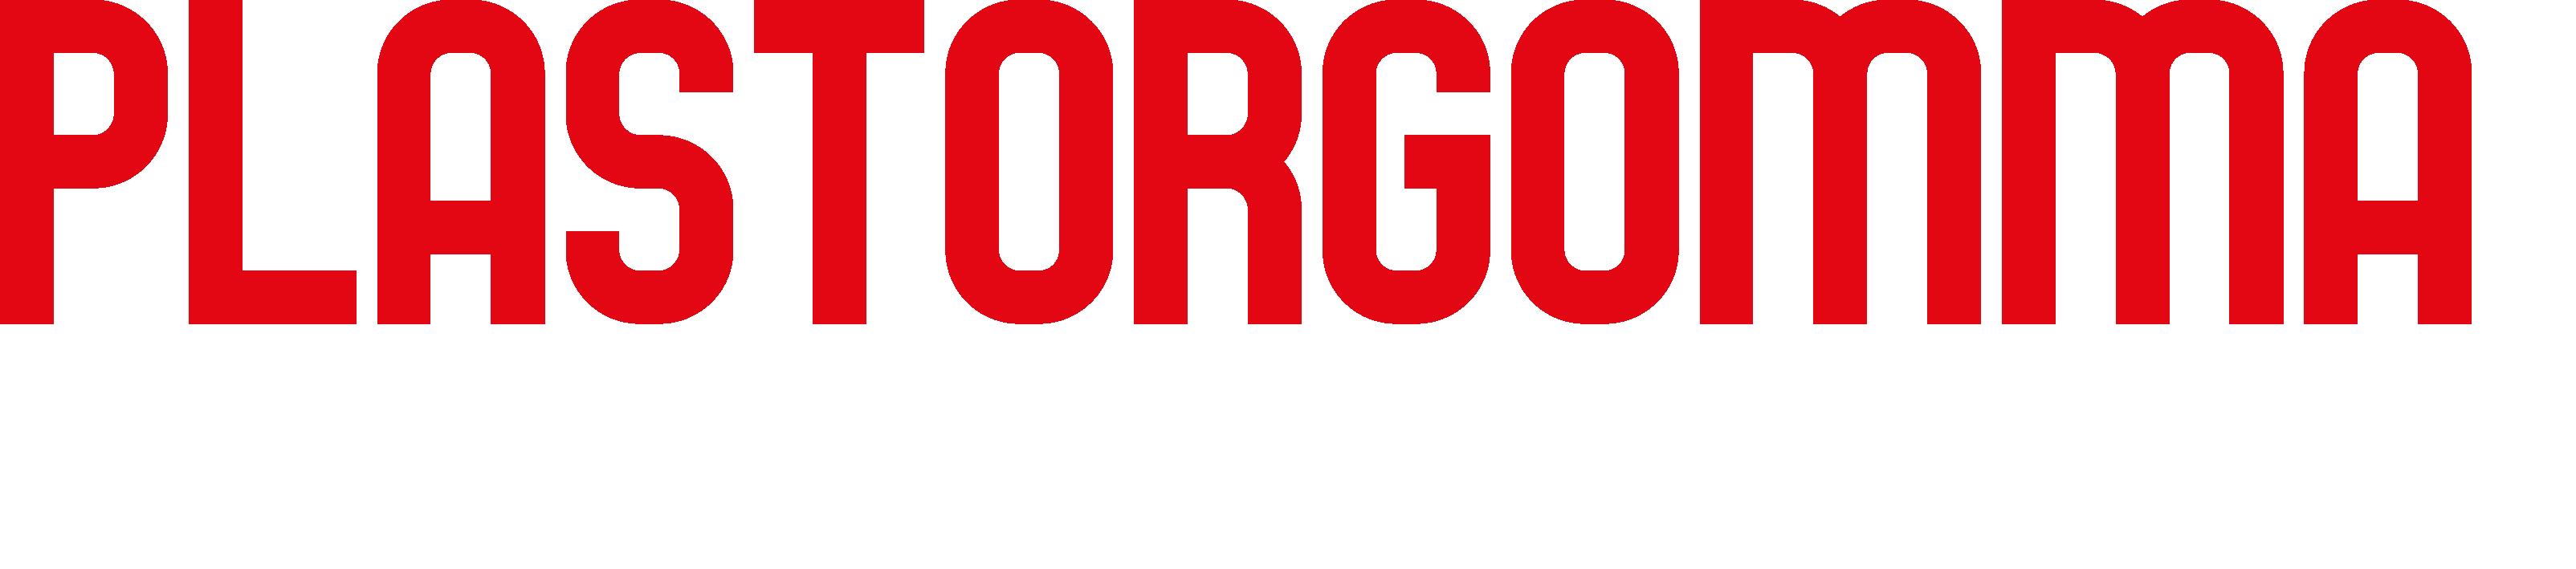 Plastorgomma logo